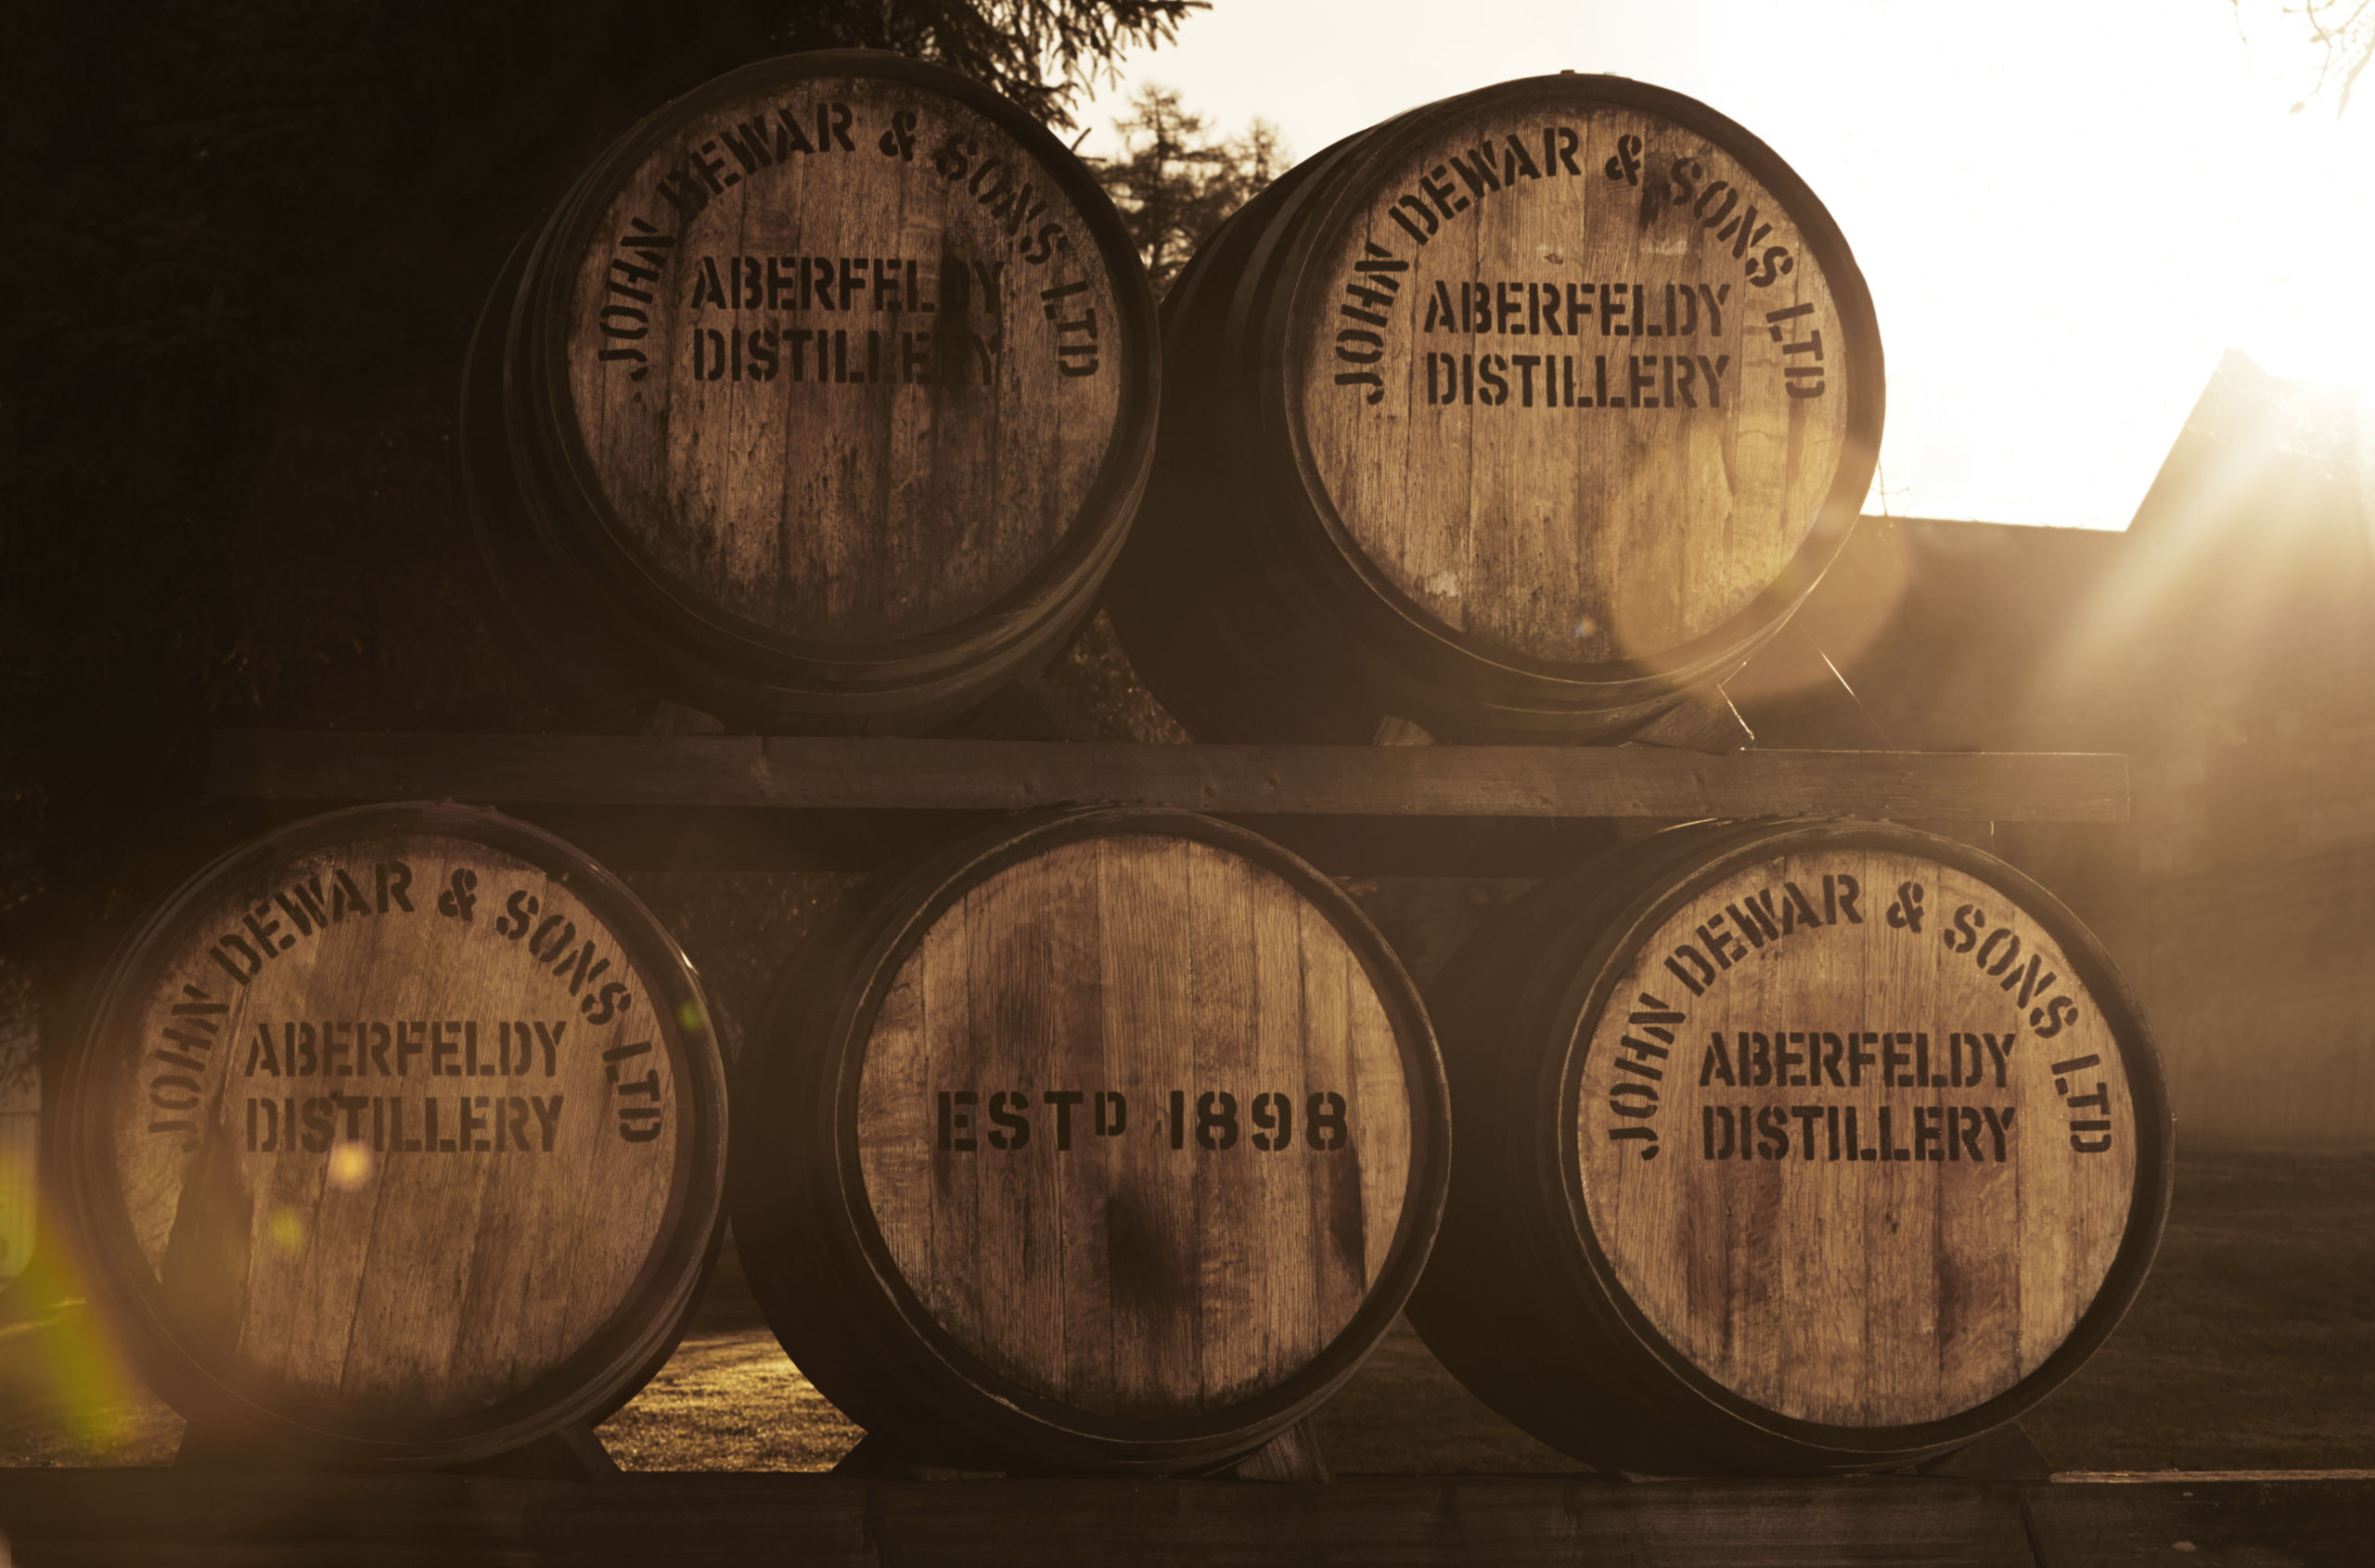 Casks of Aberfeldy Whiskey